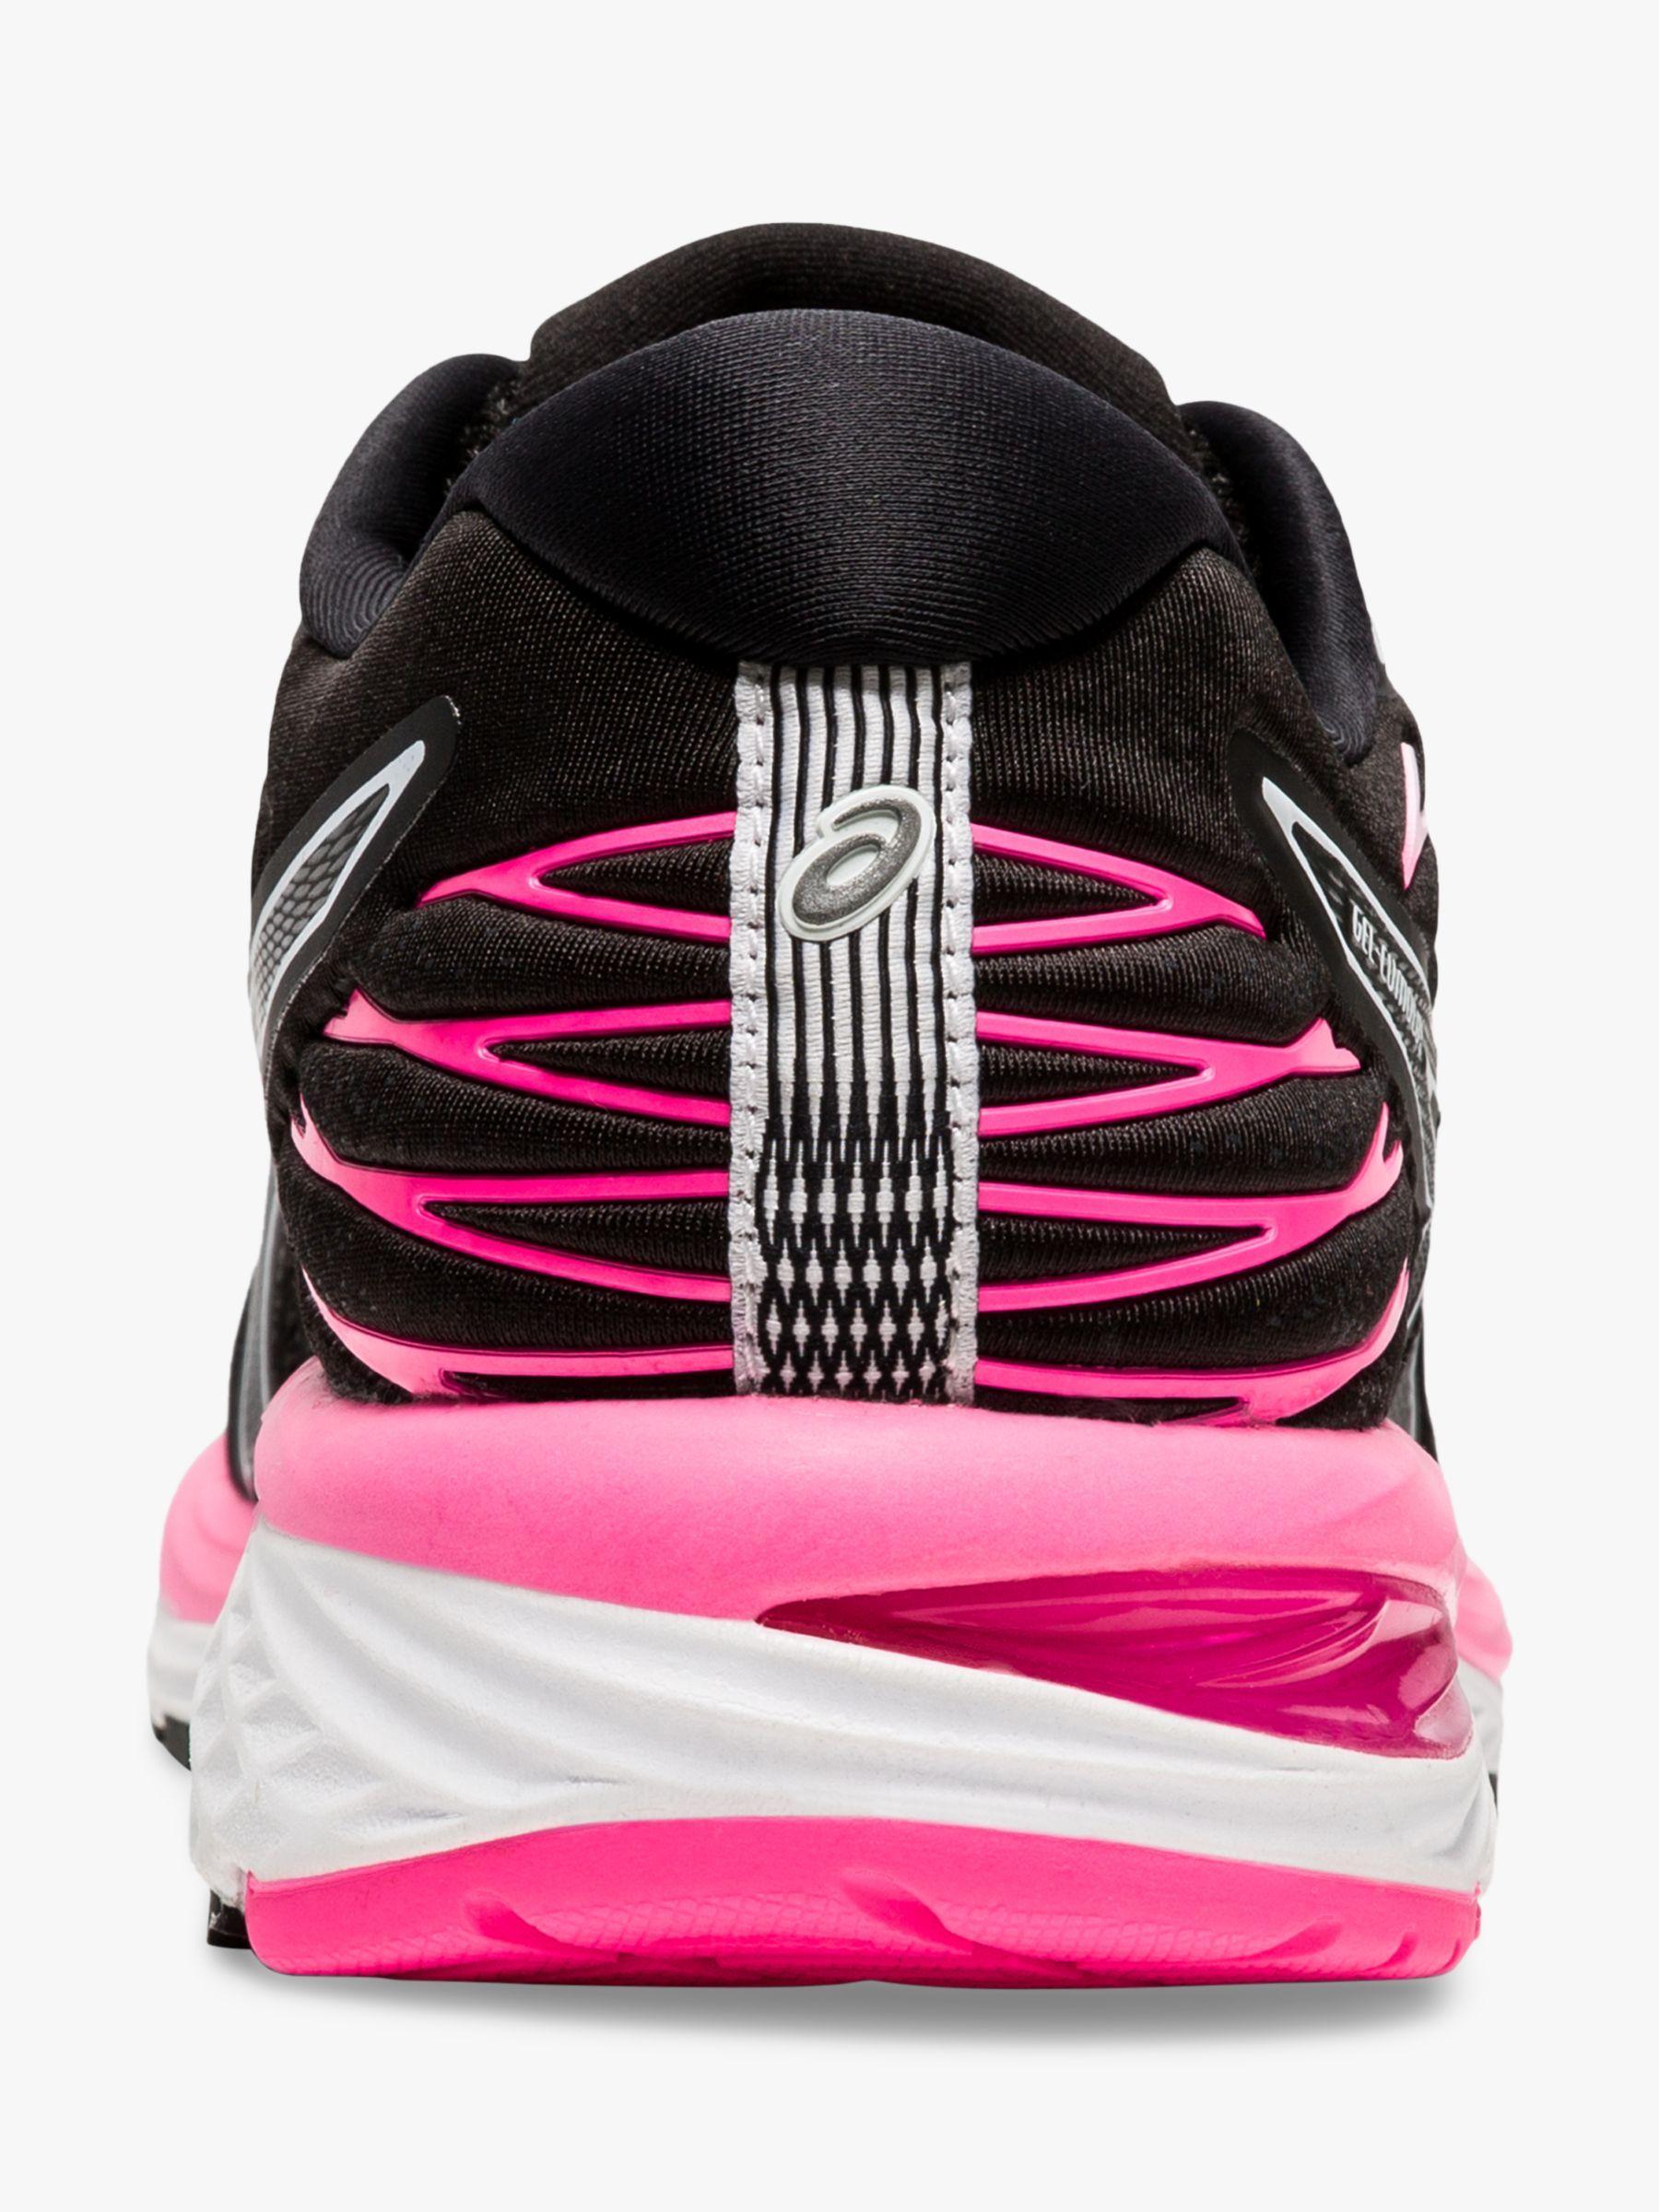 ASICS GEL-CUMULUS 21 Women's Running Shoes | Running shoes ...